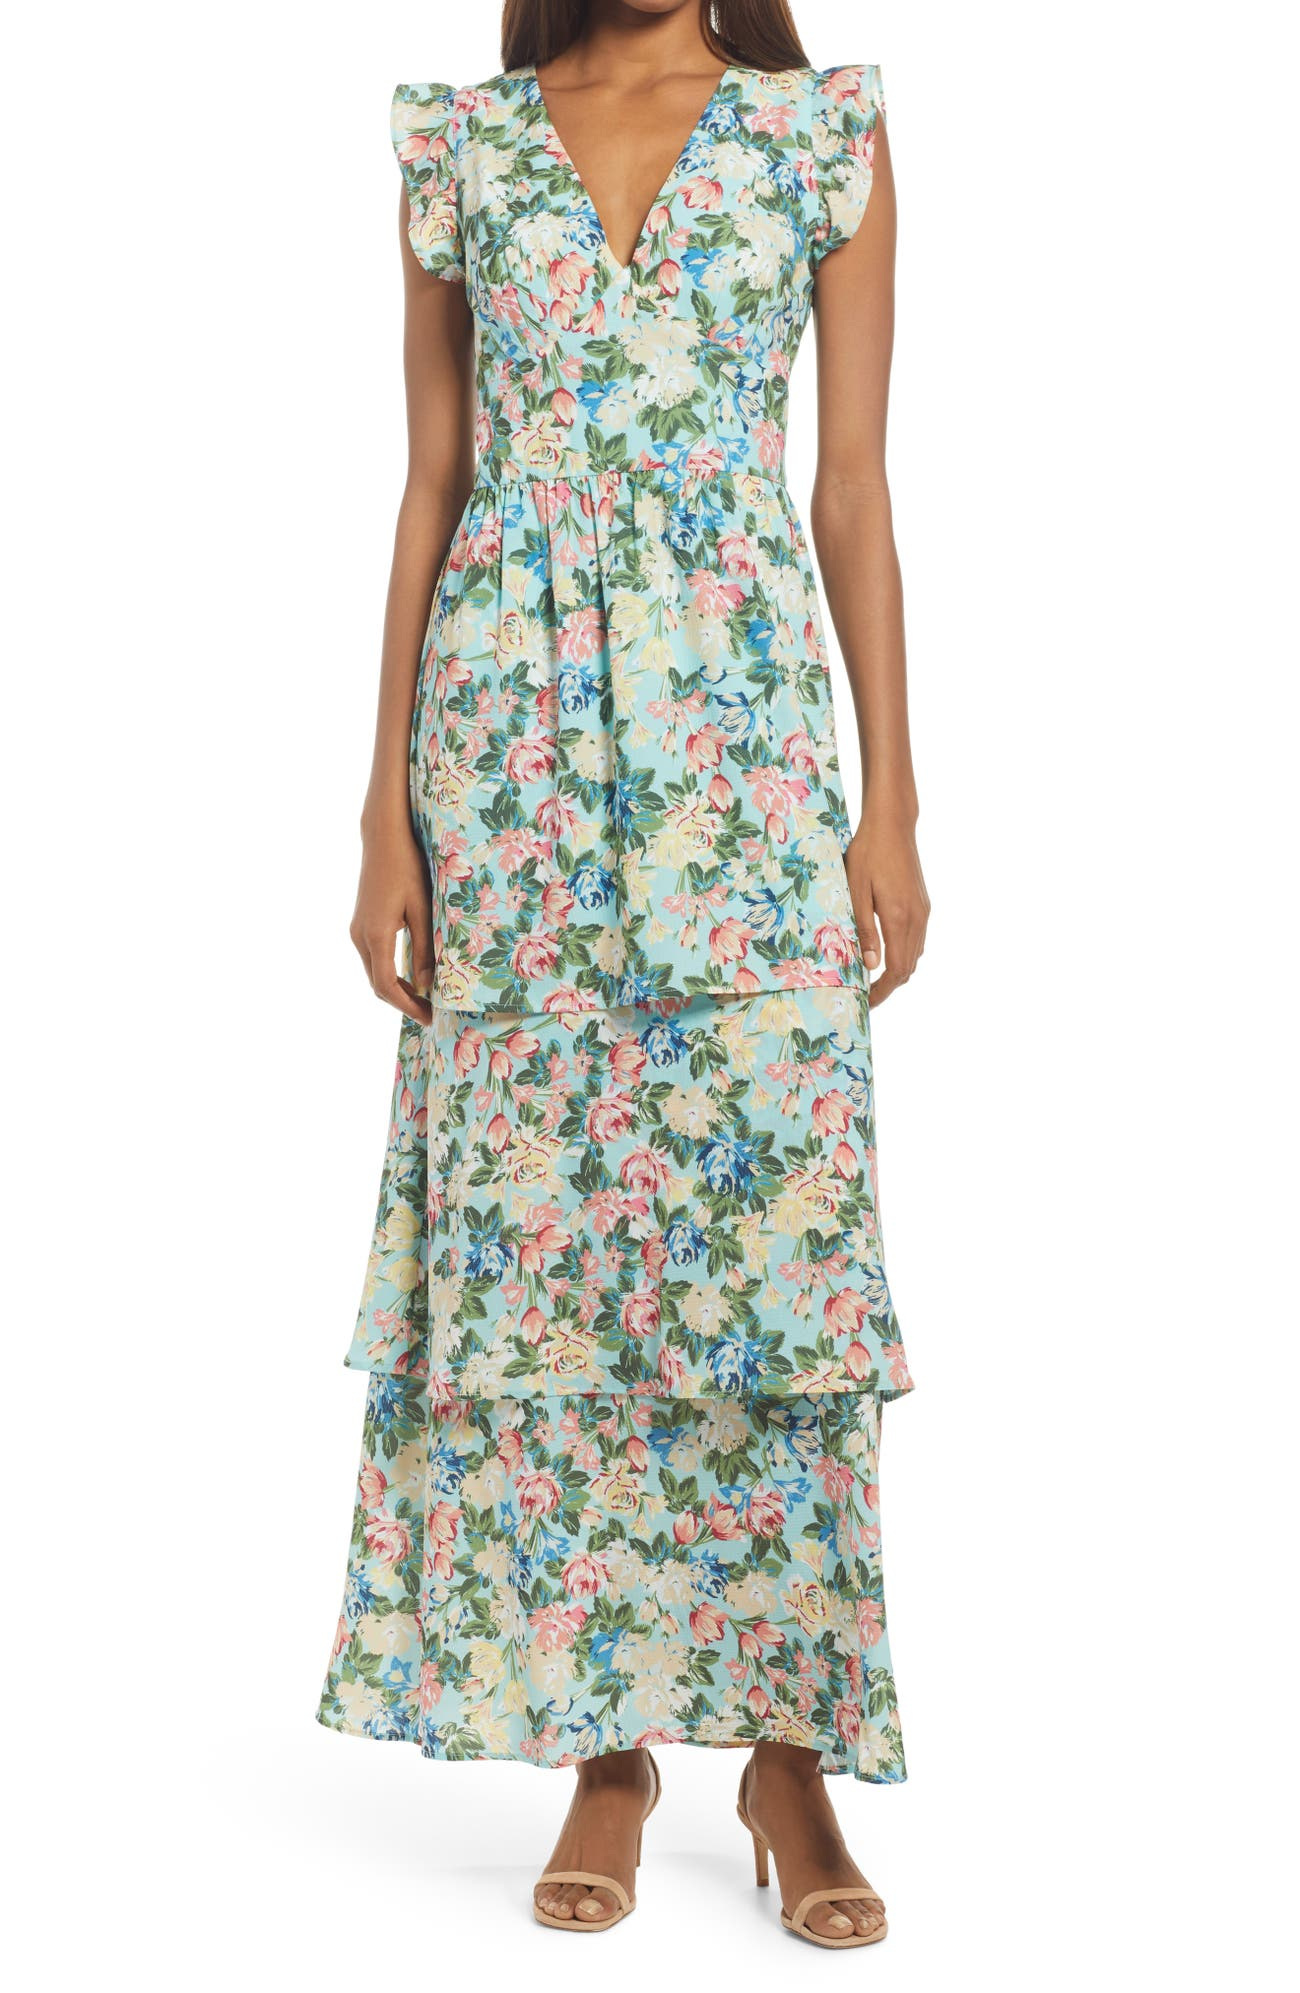 floral dress for a spring wedding